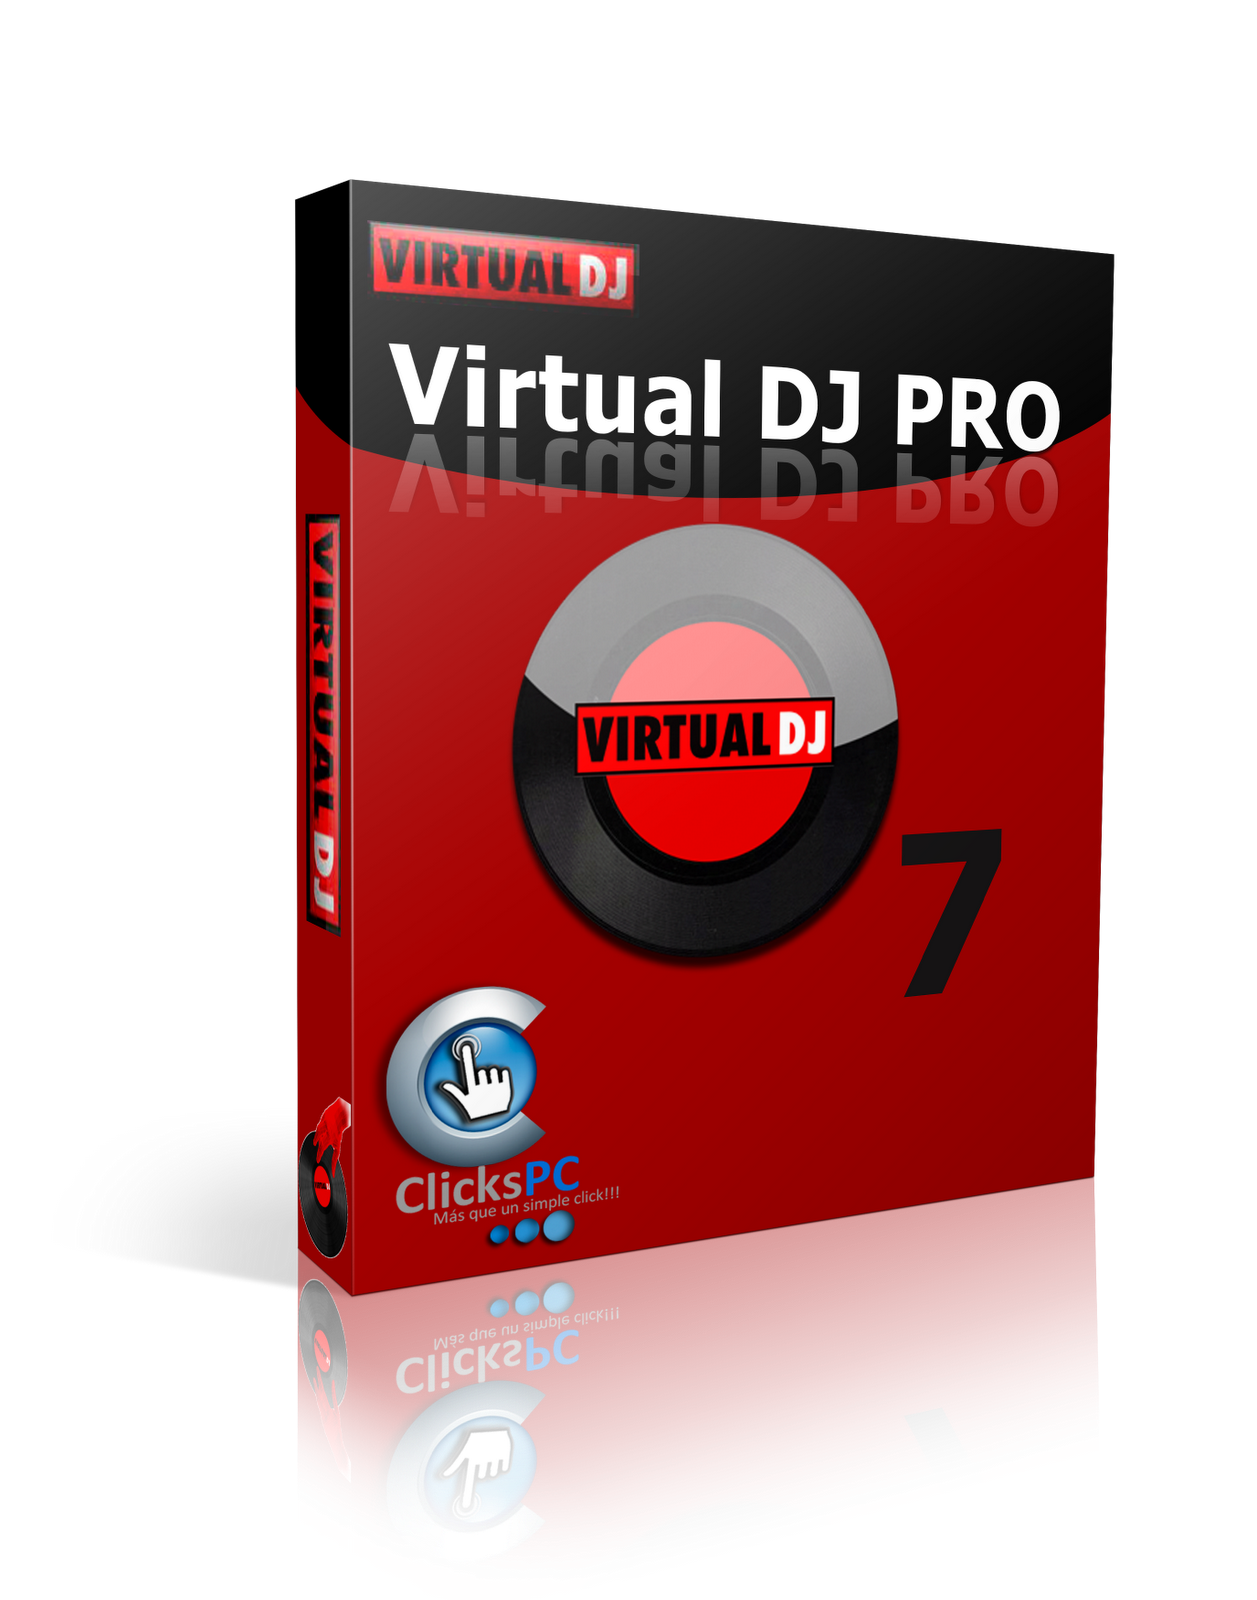 virtual dj pro 7 download